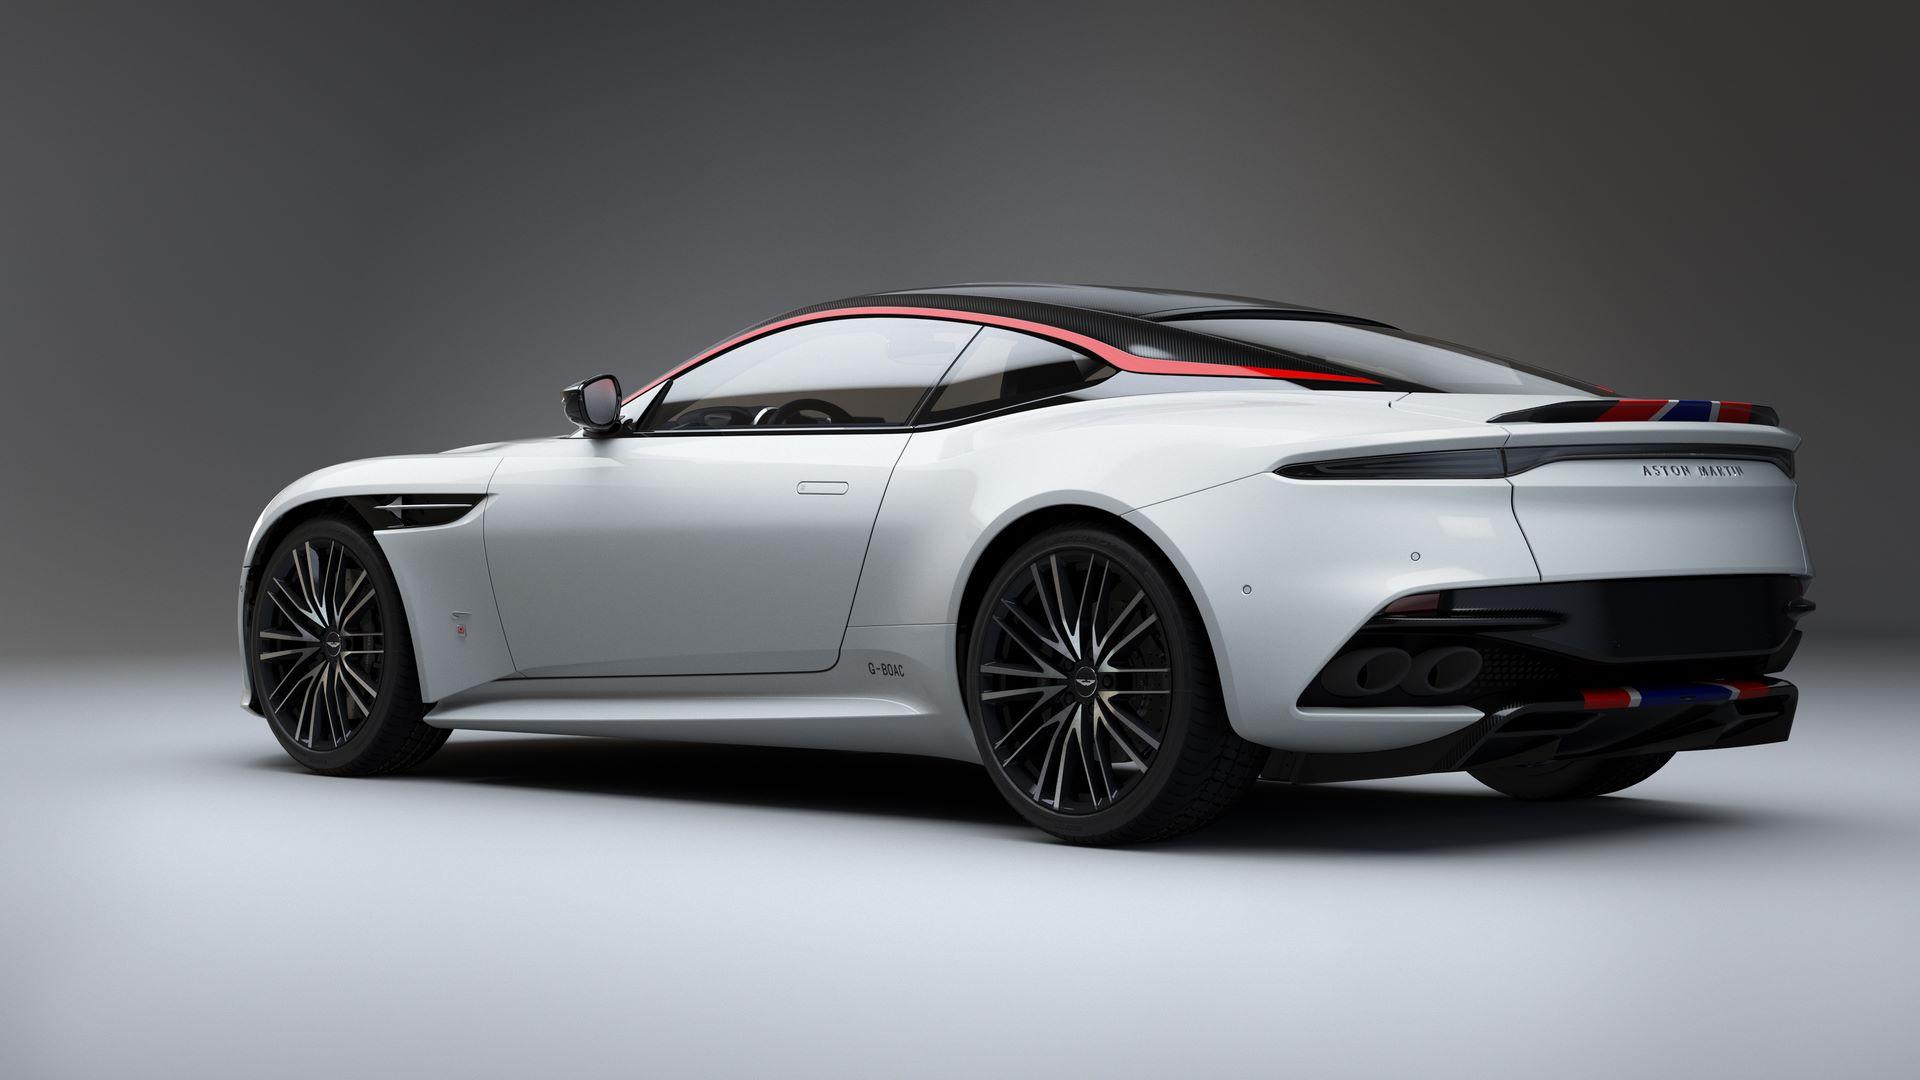 Aston-Martin-DBS-Superleggera-Concorde-Edition_09